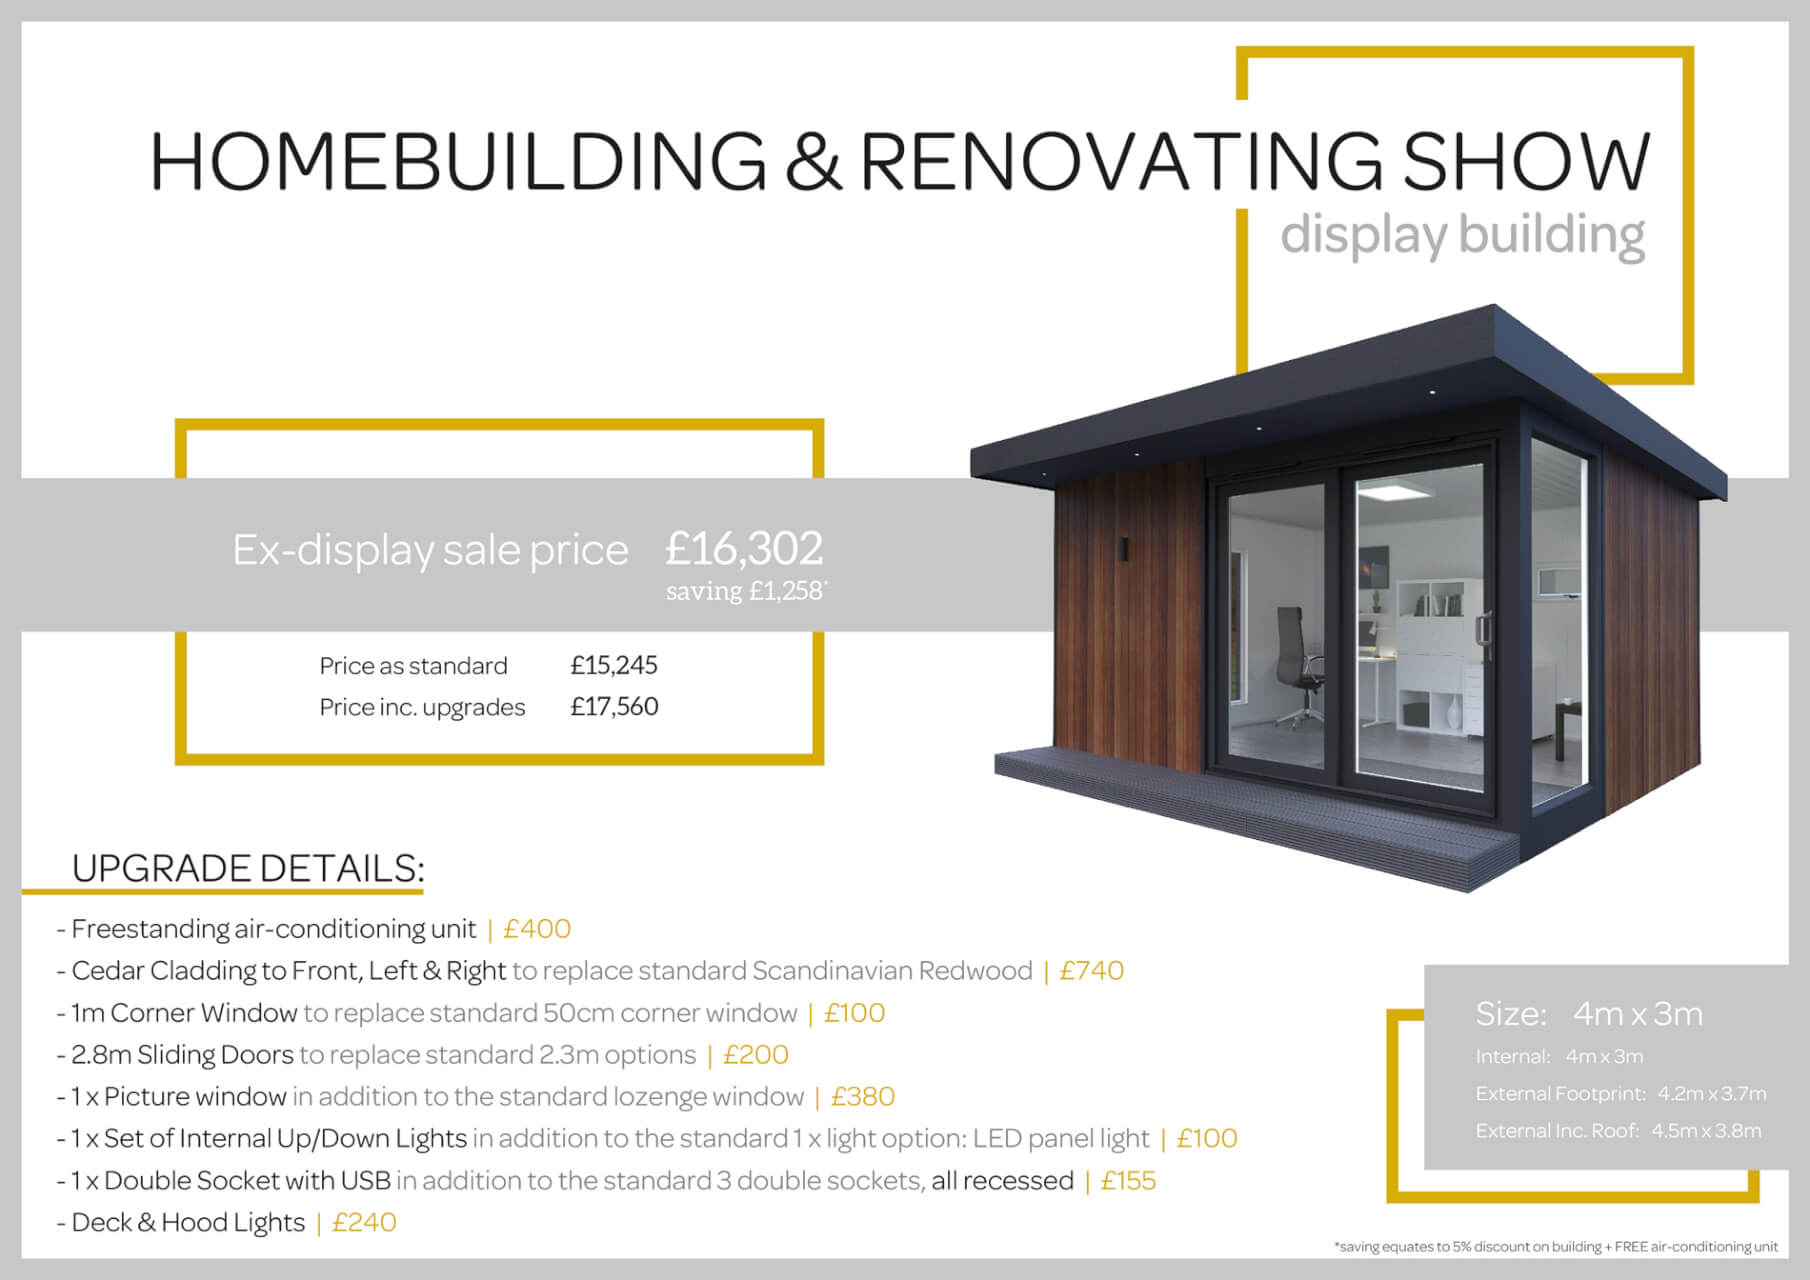 Homebuilding-Show-2018-for-Mark-01